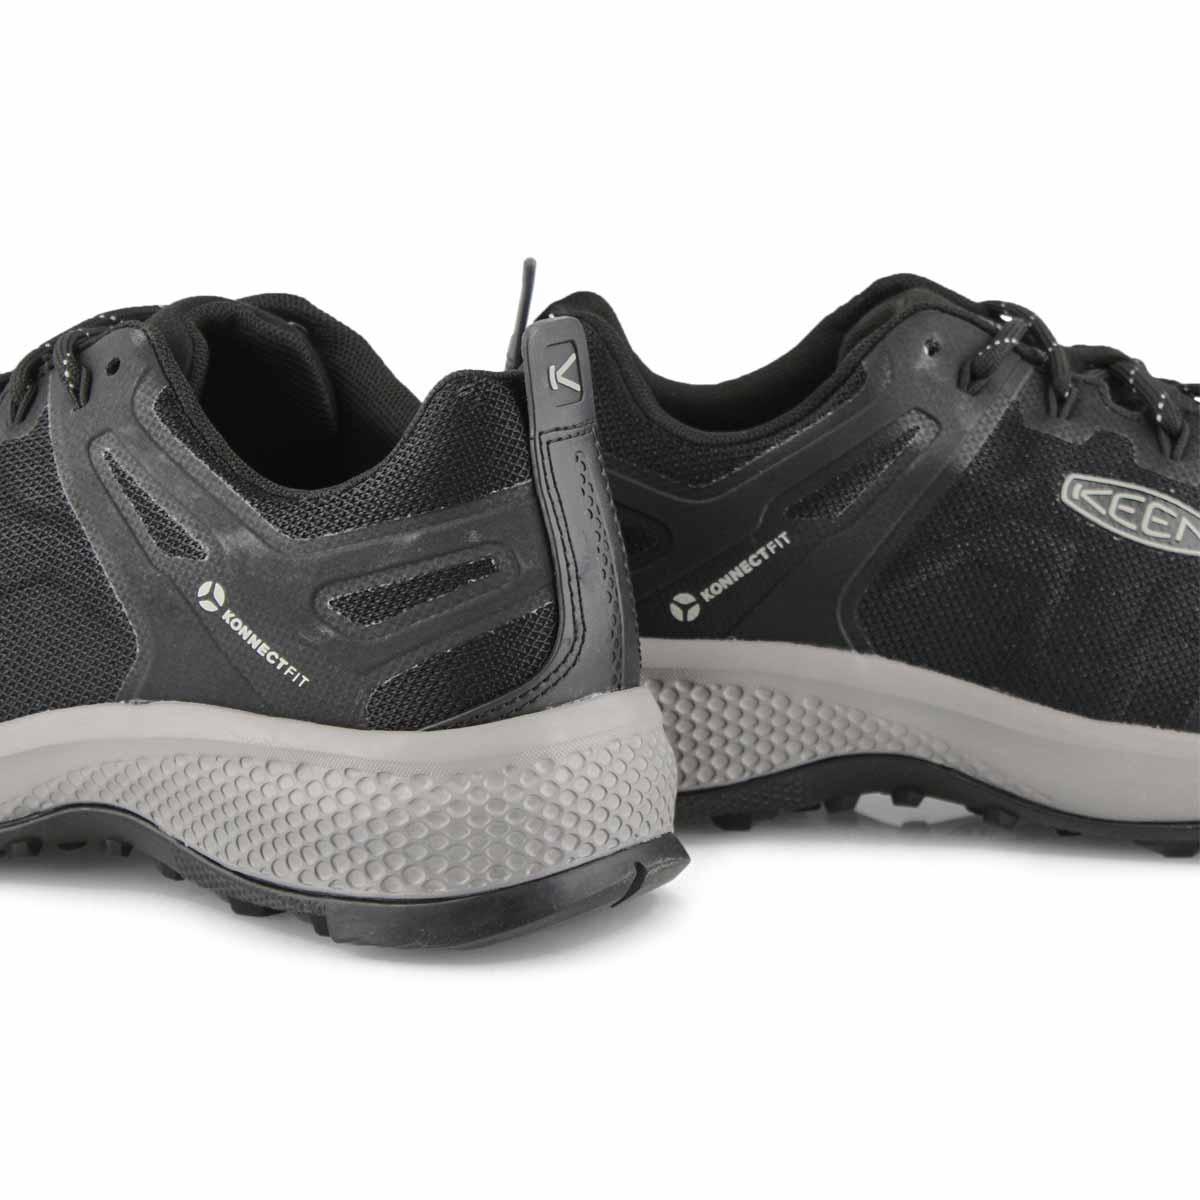 Mens Explore Vent blk/drizzle sneaker